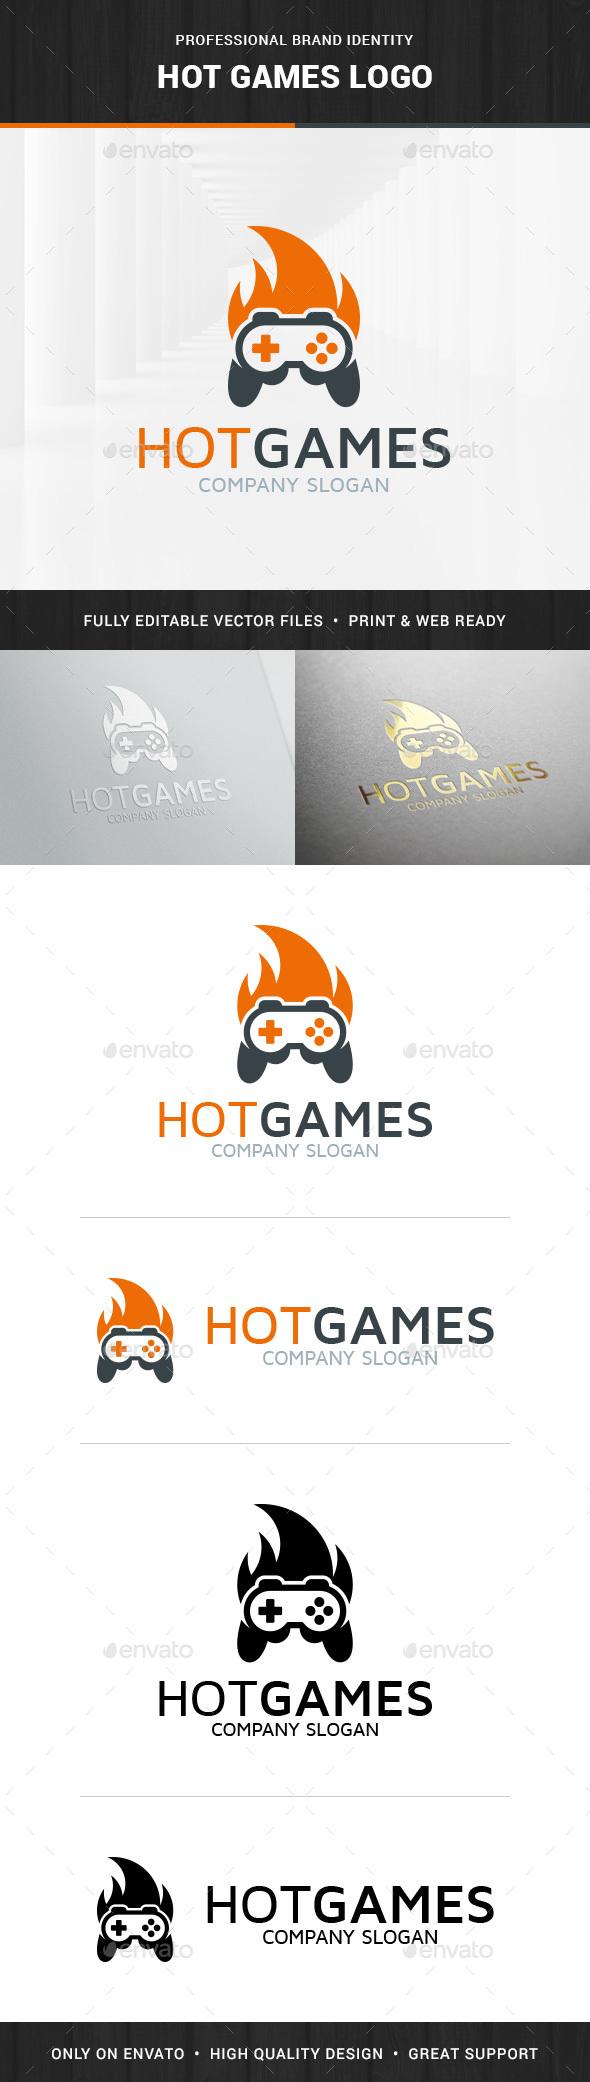 Hot Games Logo Template